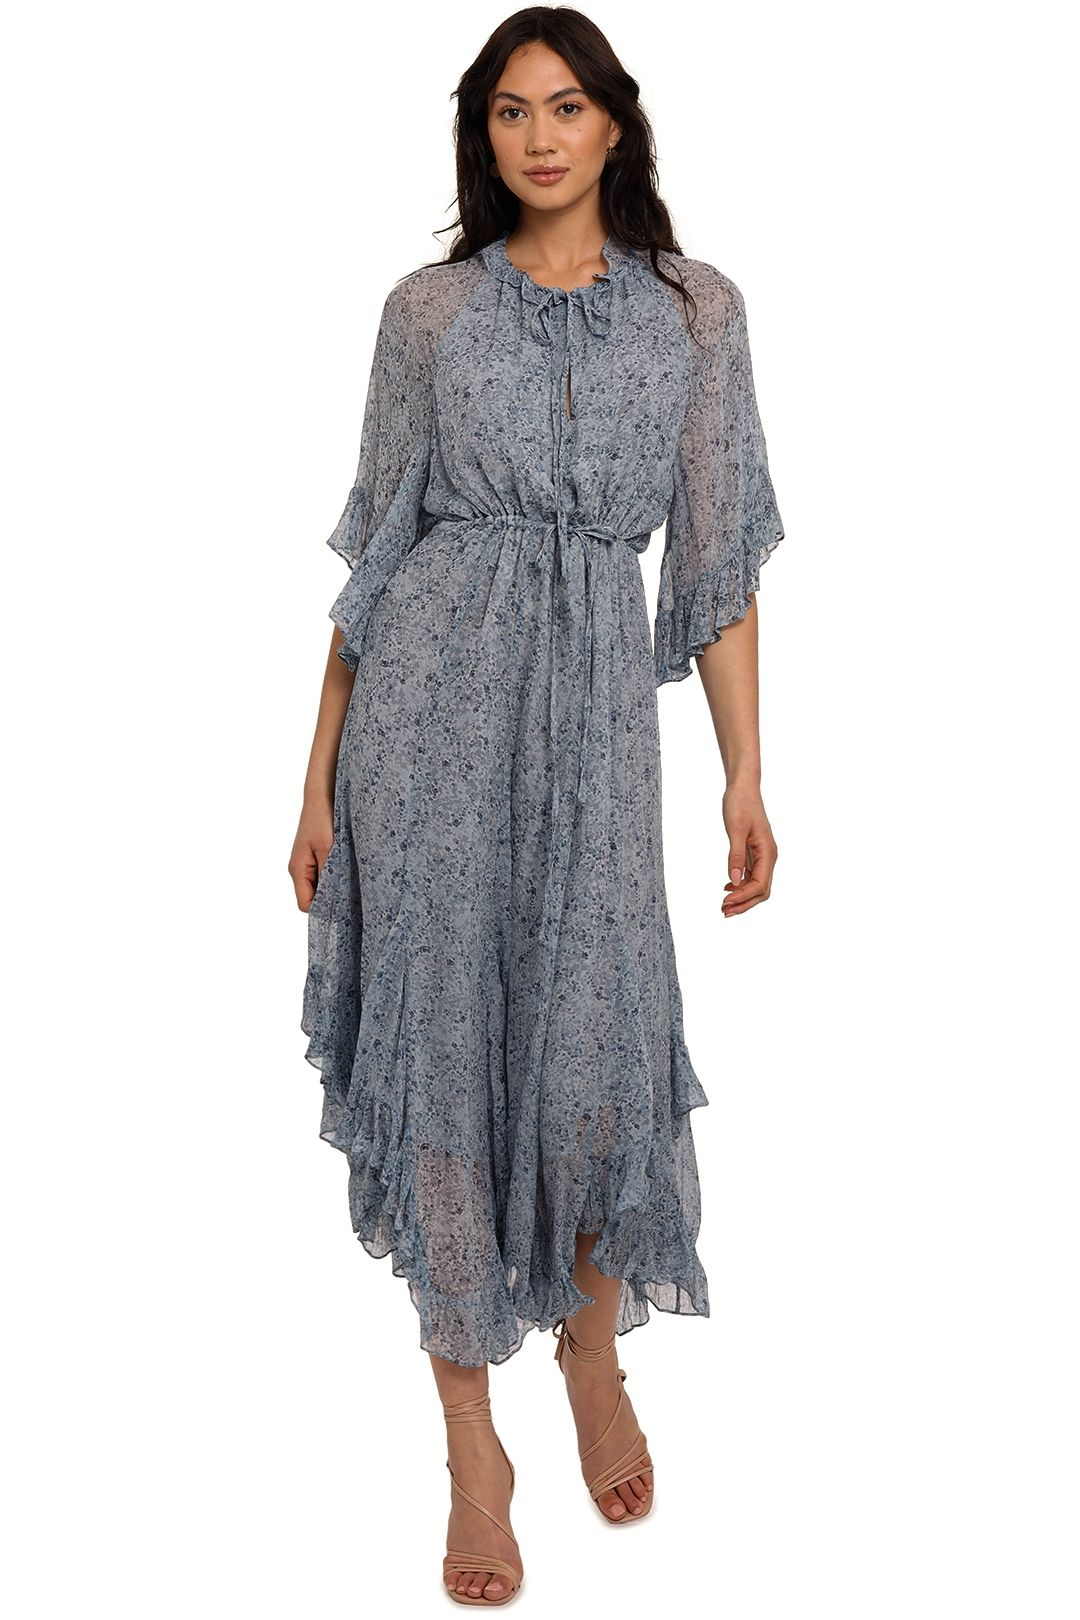 Shona Joy Harmony Flutter Sleeve Midi Dress